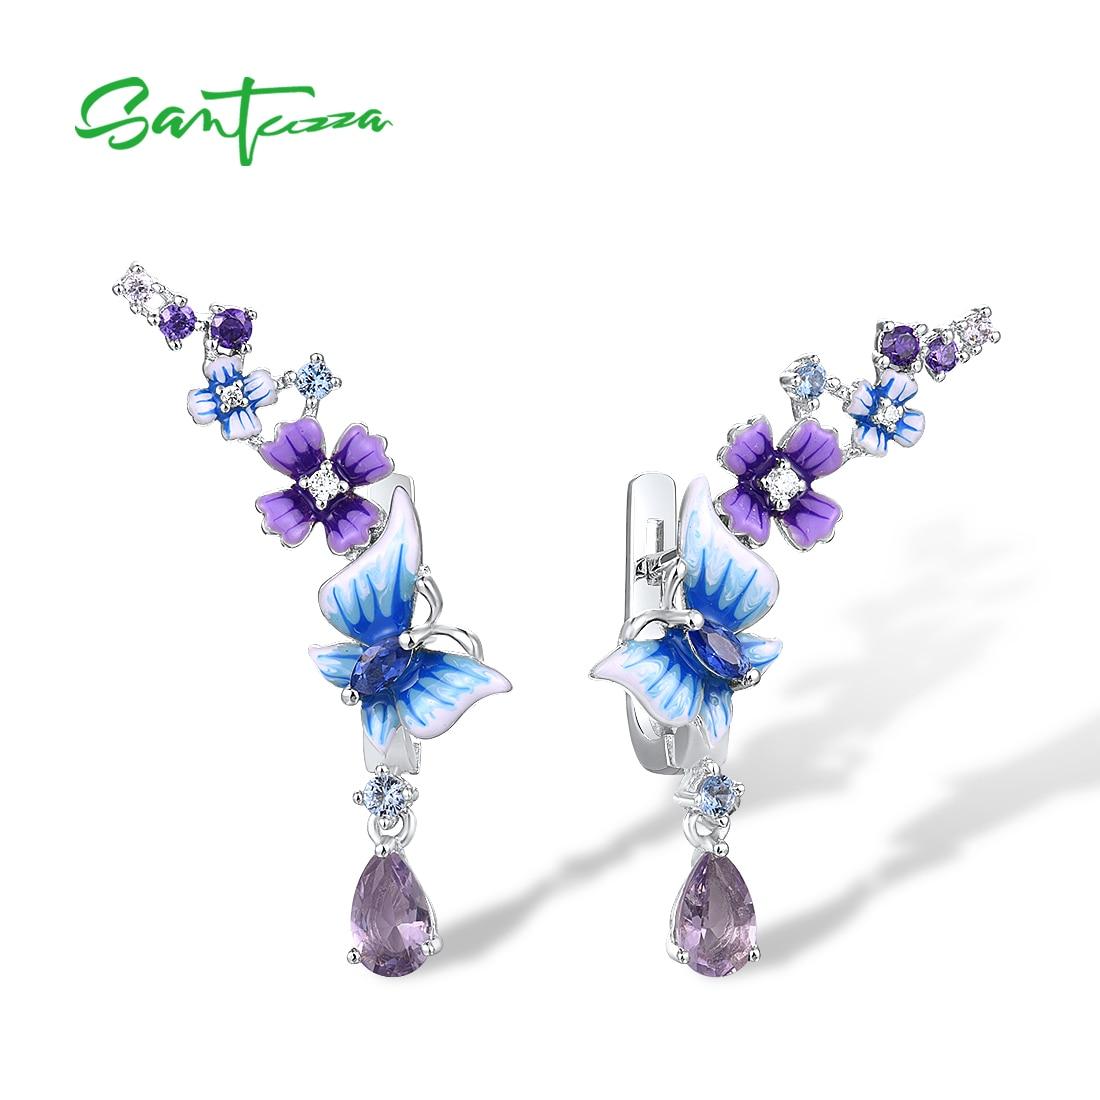 Klapp-Creolen mit blau-lila 3D Blüten, Schmetterlingen und Kristall-Tropfen | 925 Ohrringe 925 Klappcreolen mit Anhänger Frühling